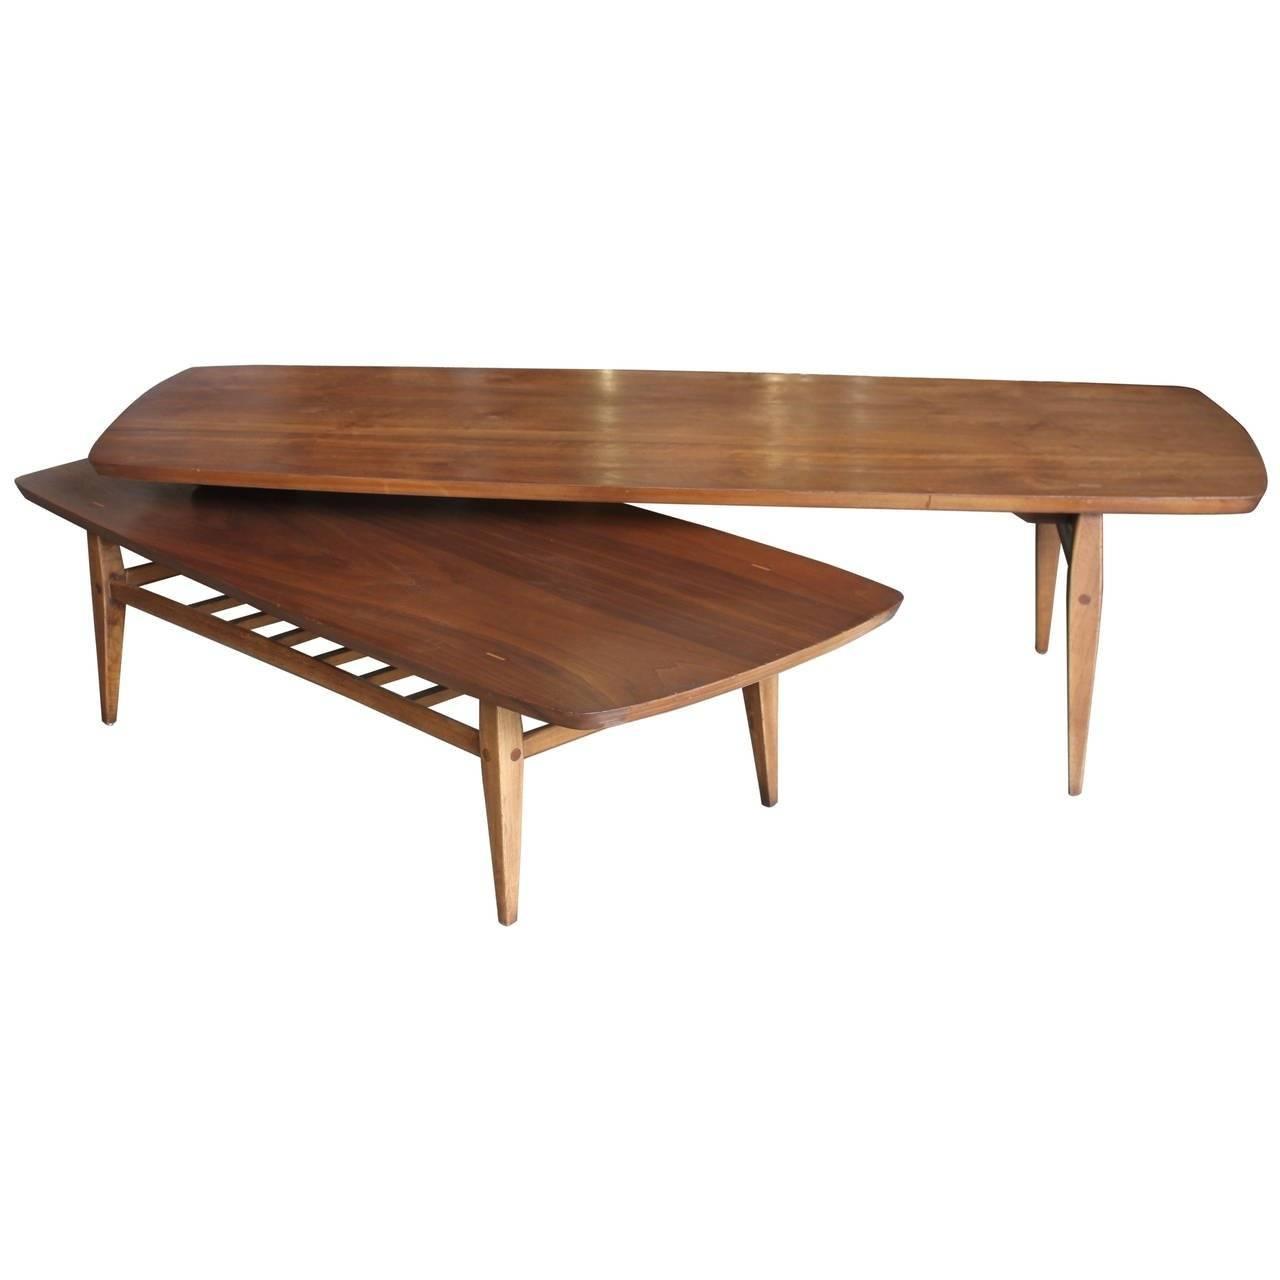 Furniture: Curve Coffee Table | Narrow Coffee Tables | Swivel intended for Narrow Coffee Tables (Image 14 of 30)